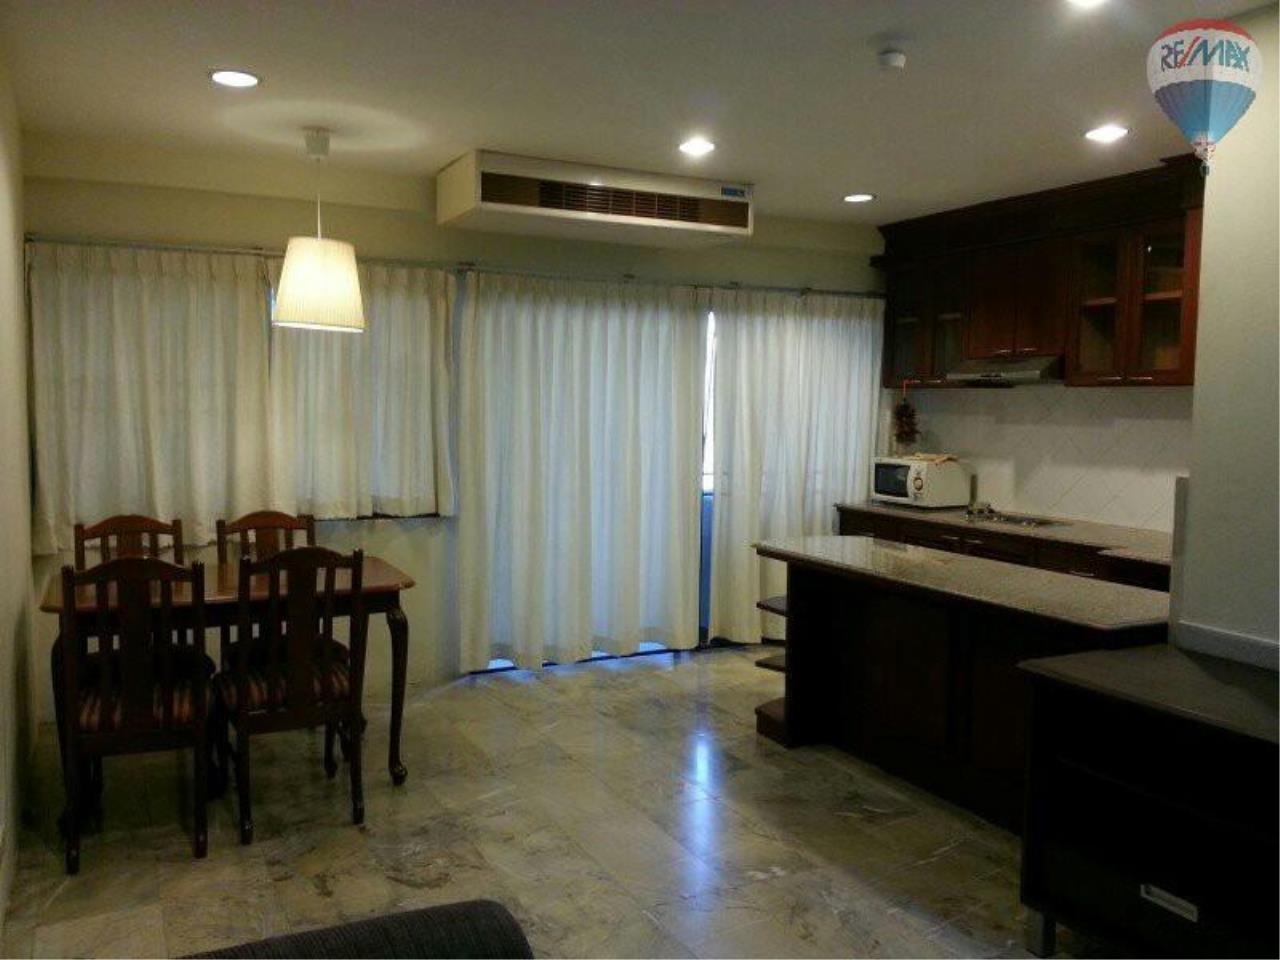 RE/MAX Properties Agency's 1 Bedroom 56 Sq.m for SALE at Saranjai Mansion,Sukhumvit Soi 4 (Nana) 7